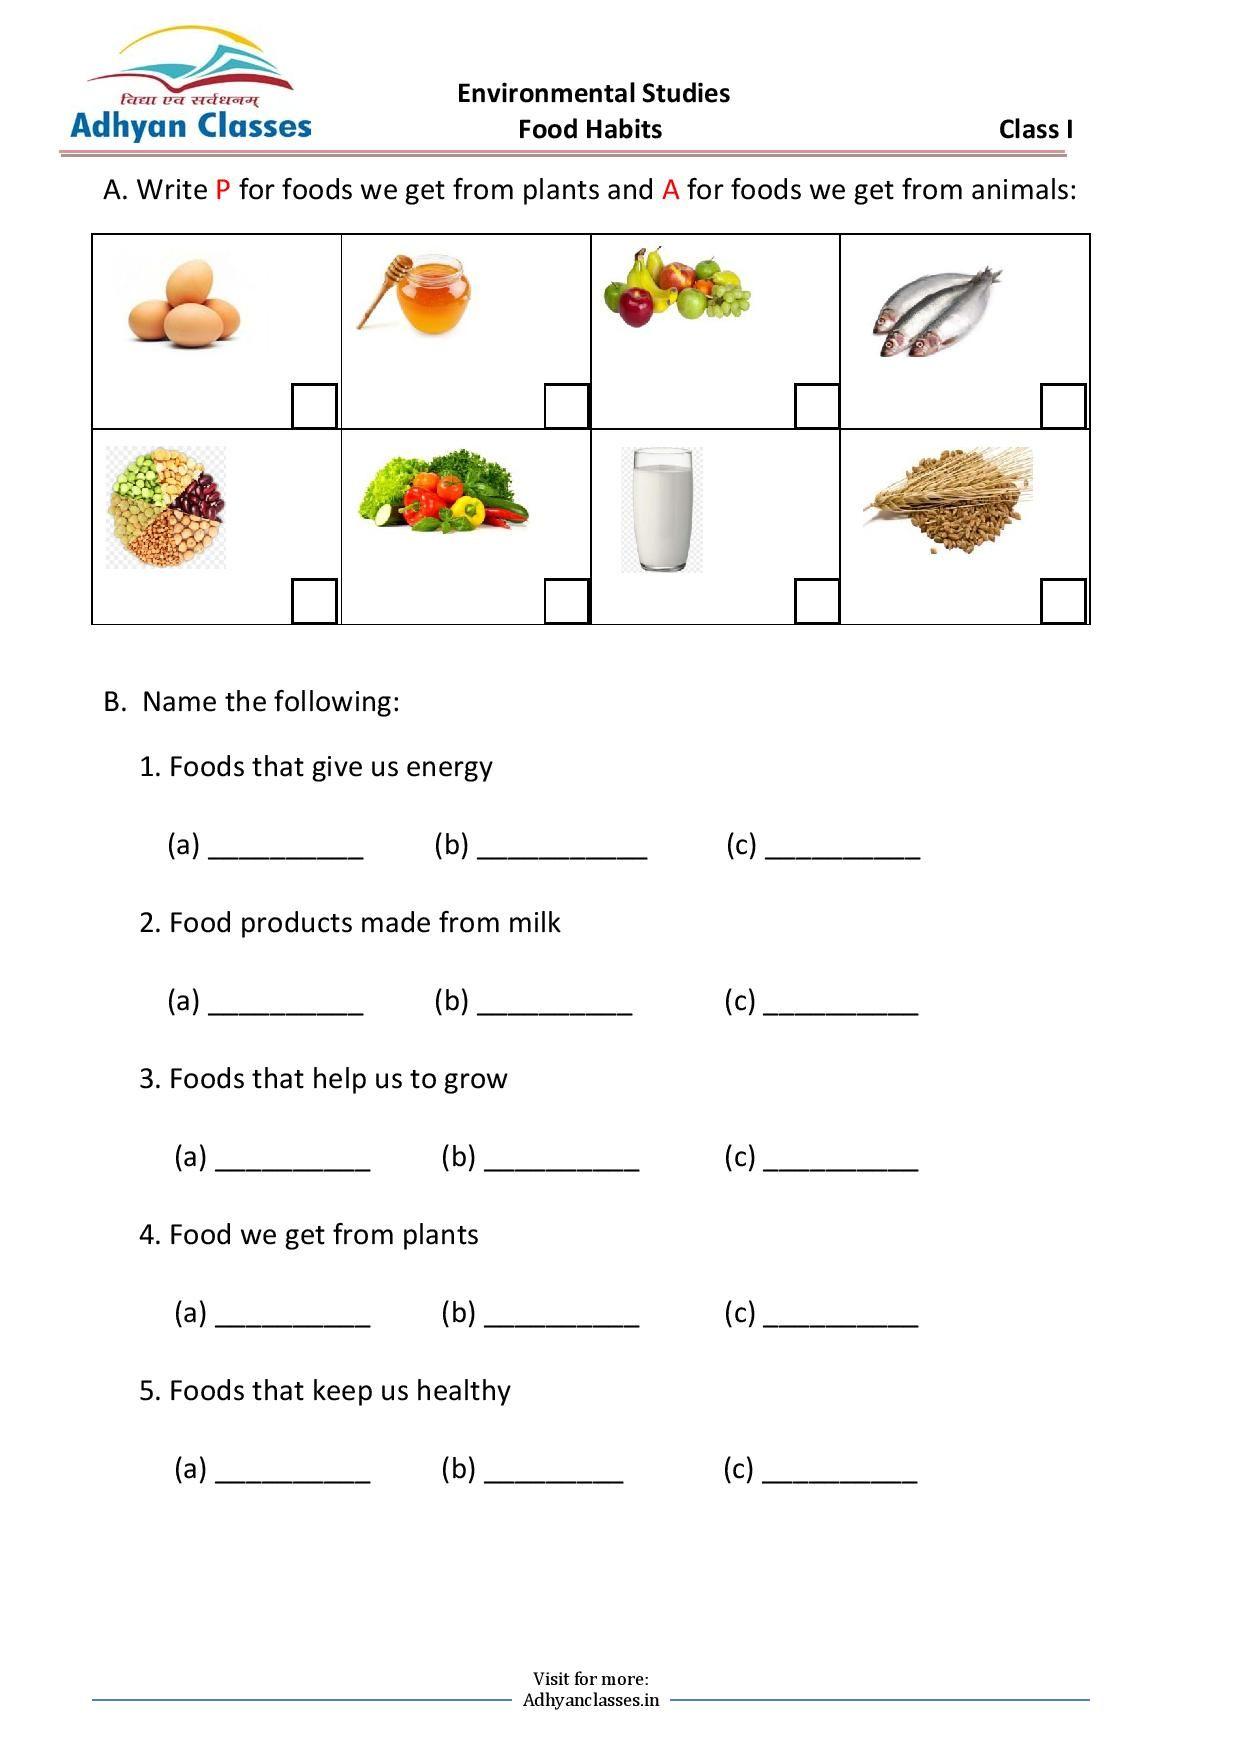 medium resolution of Food Habits Worksheets for Grade I   Food